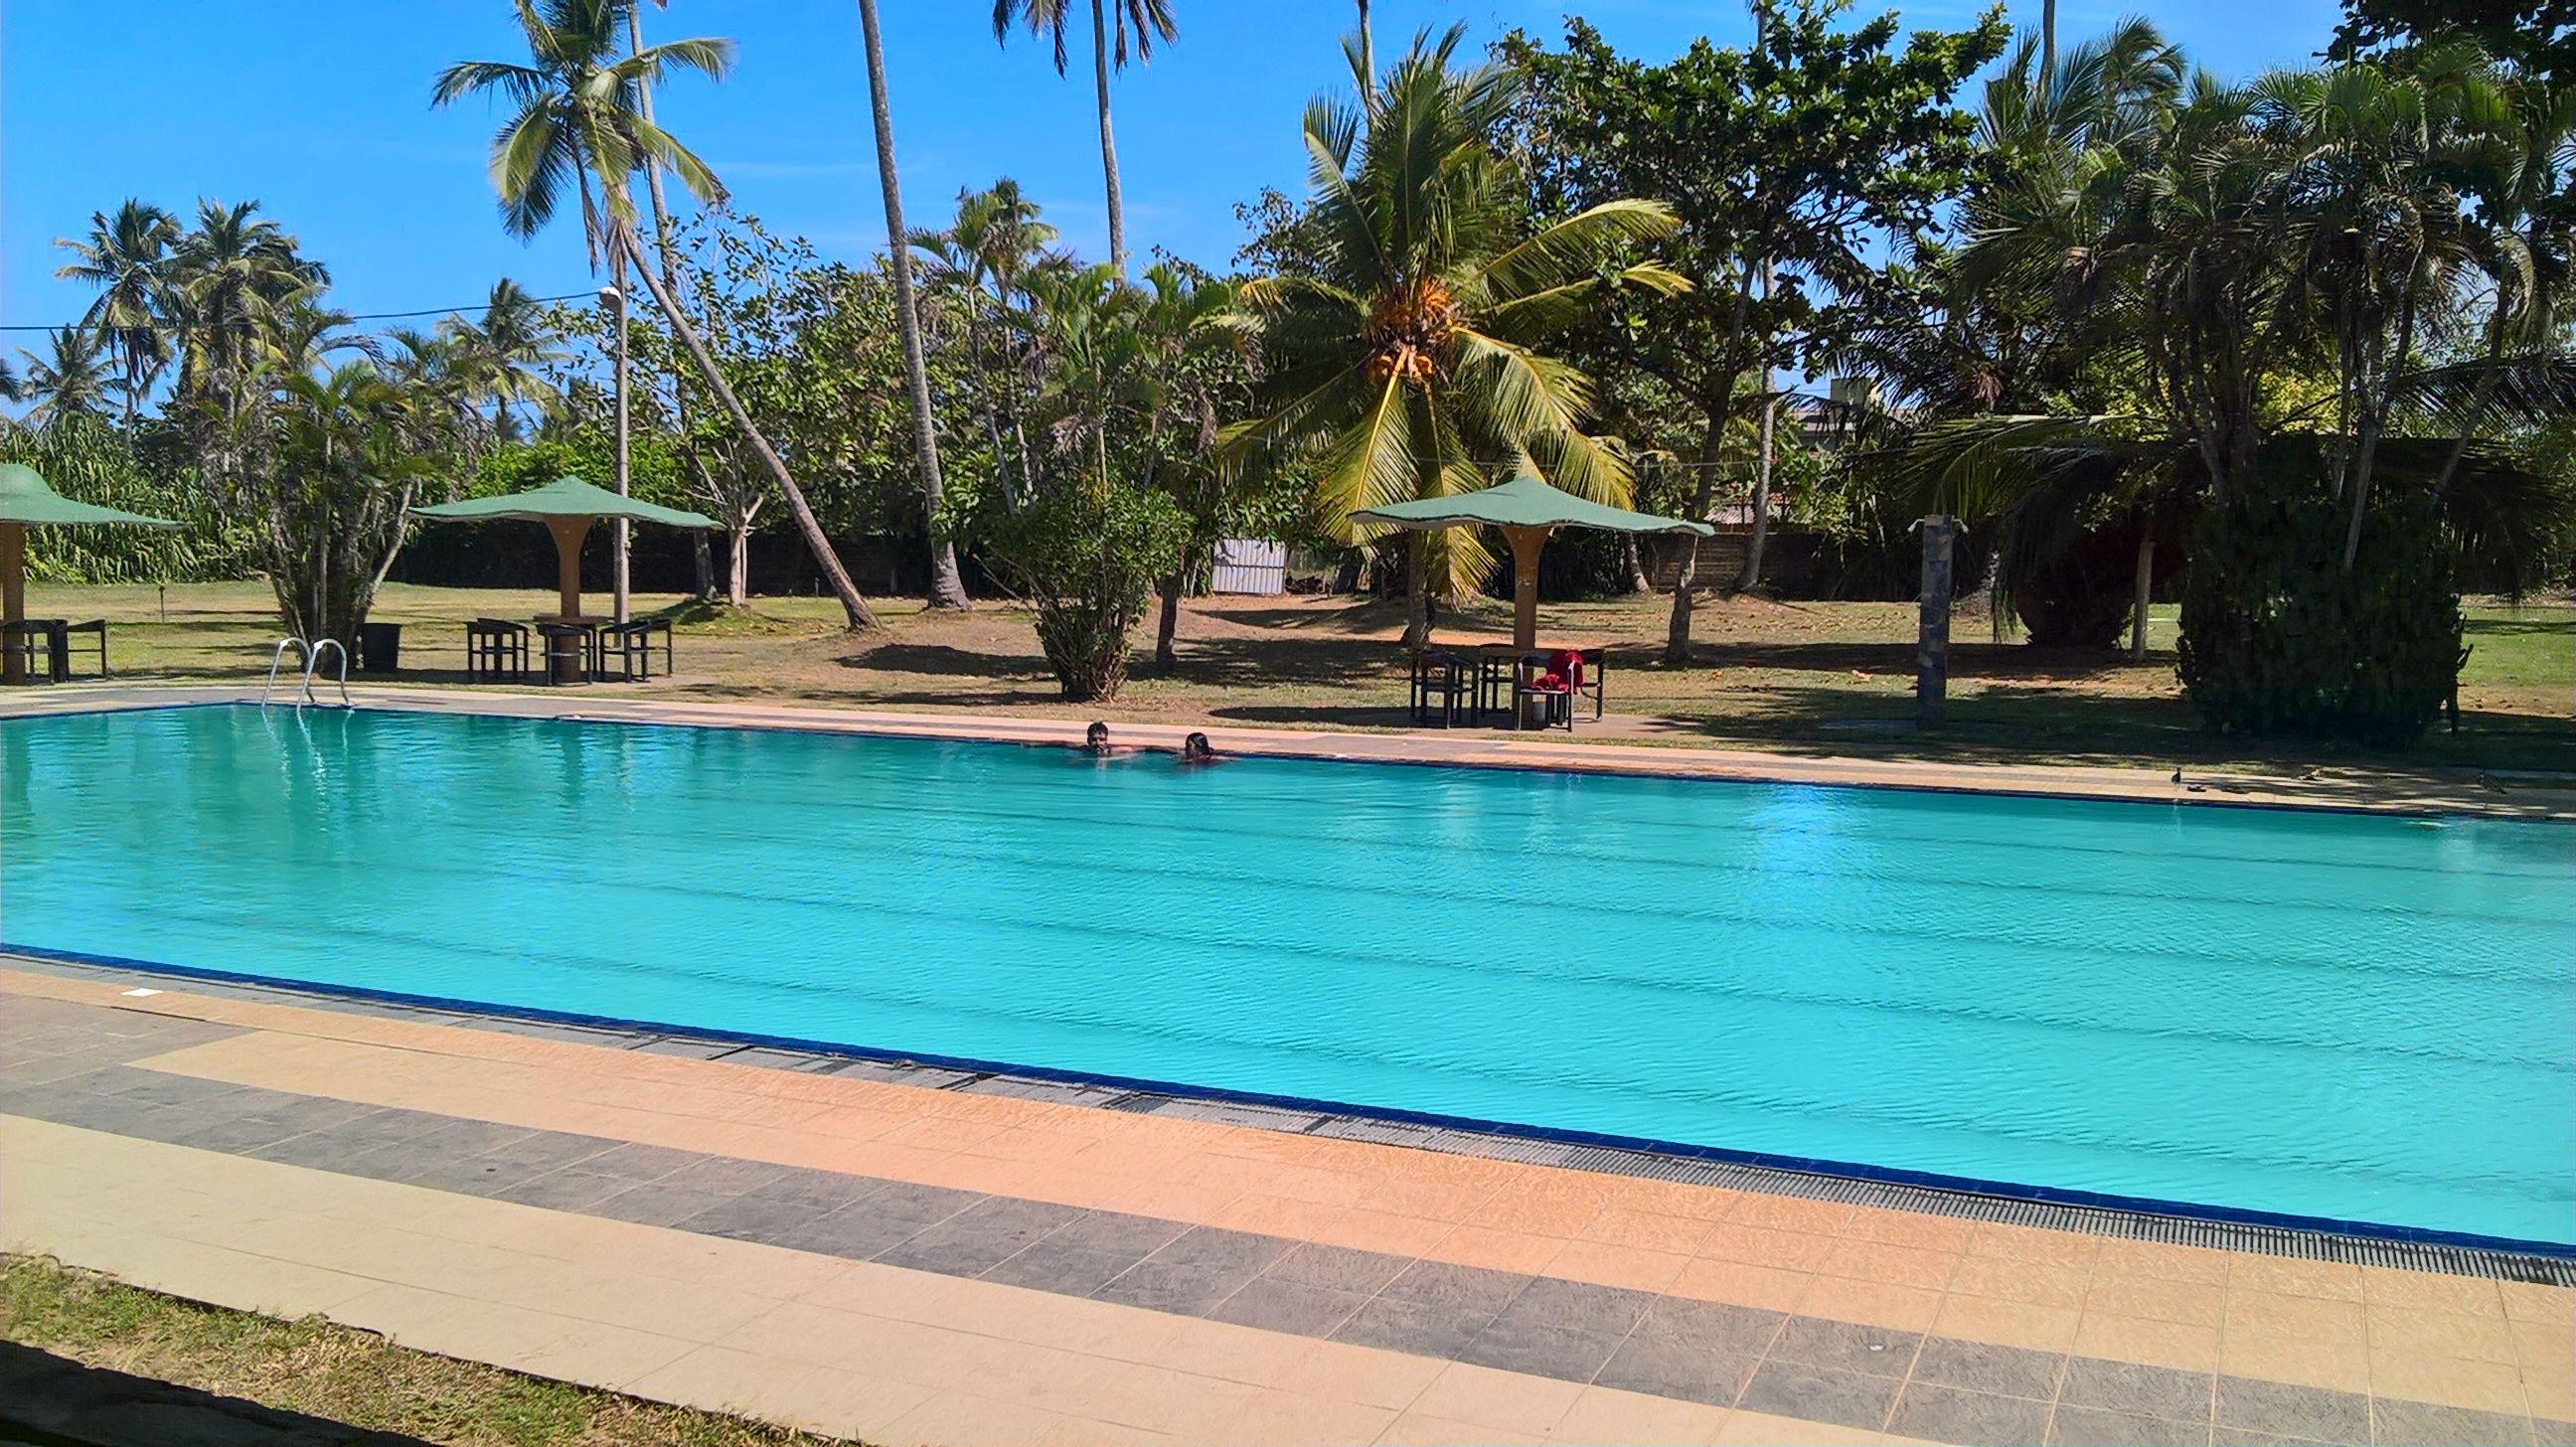 A Swimming Pool At A Hotel In Sri Lanka